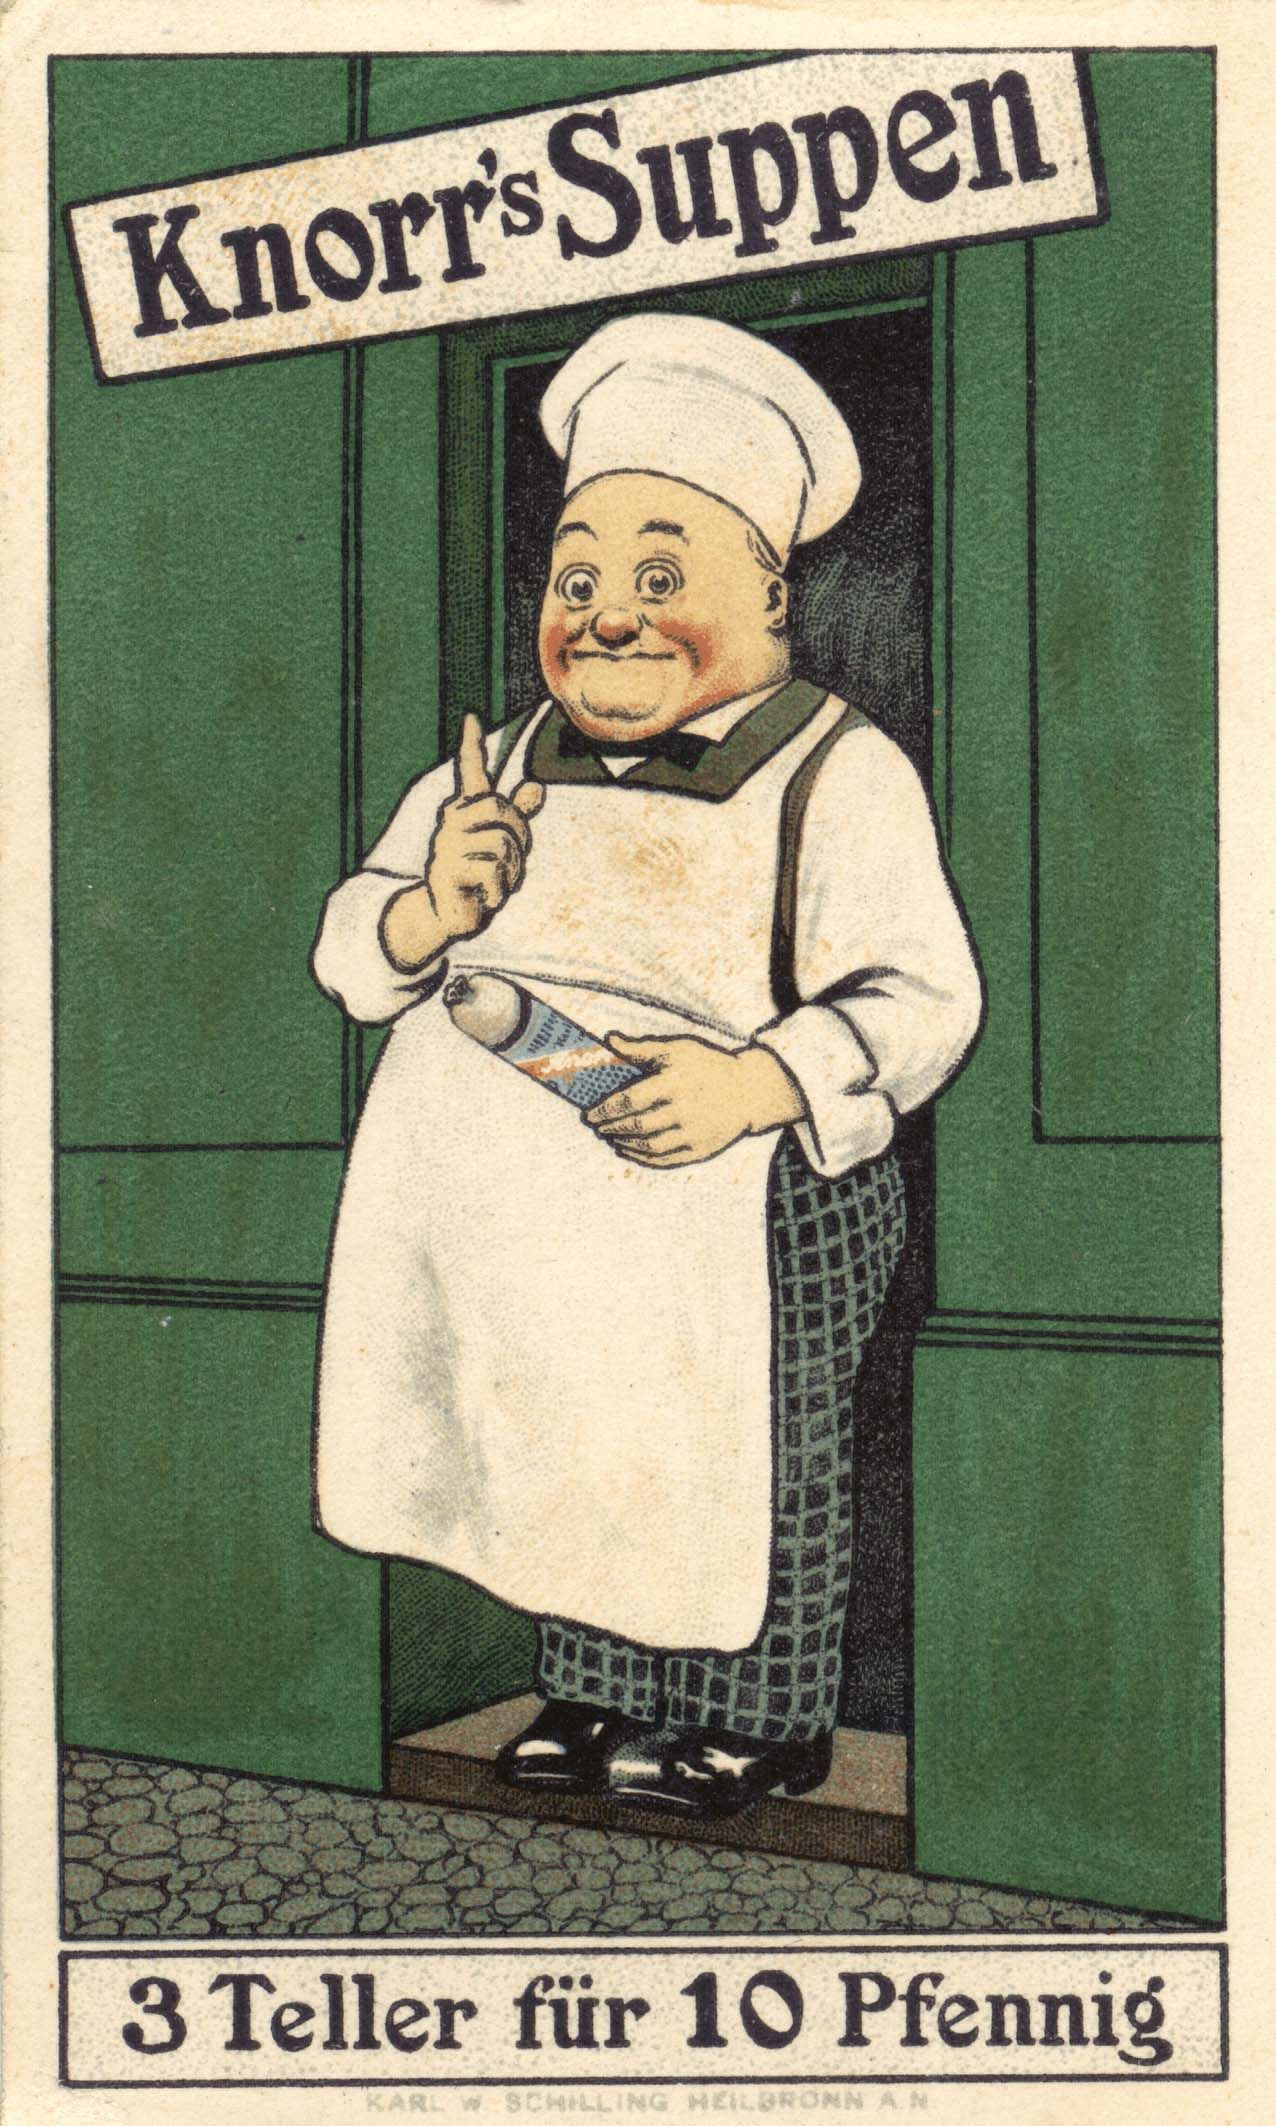 https://www.adpublica.com/media//ad-publica/meldung/knorr-werbung-ca.-1914.jpg